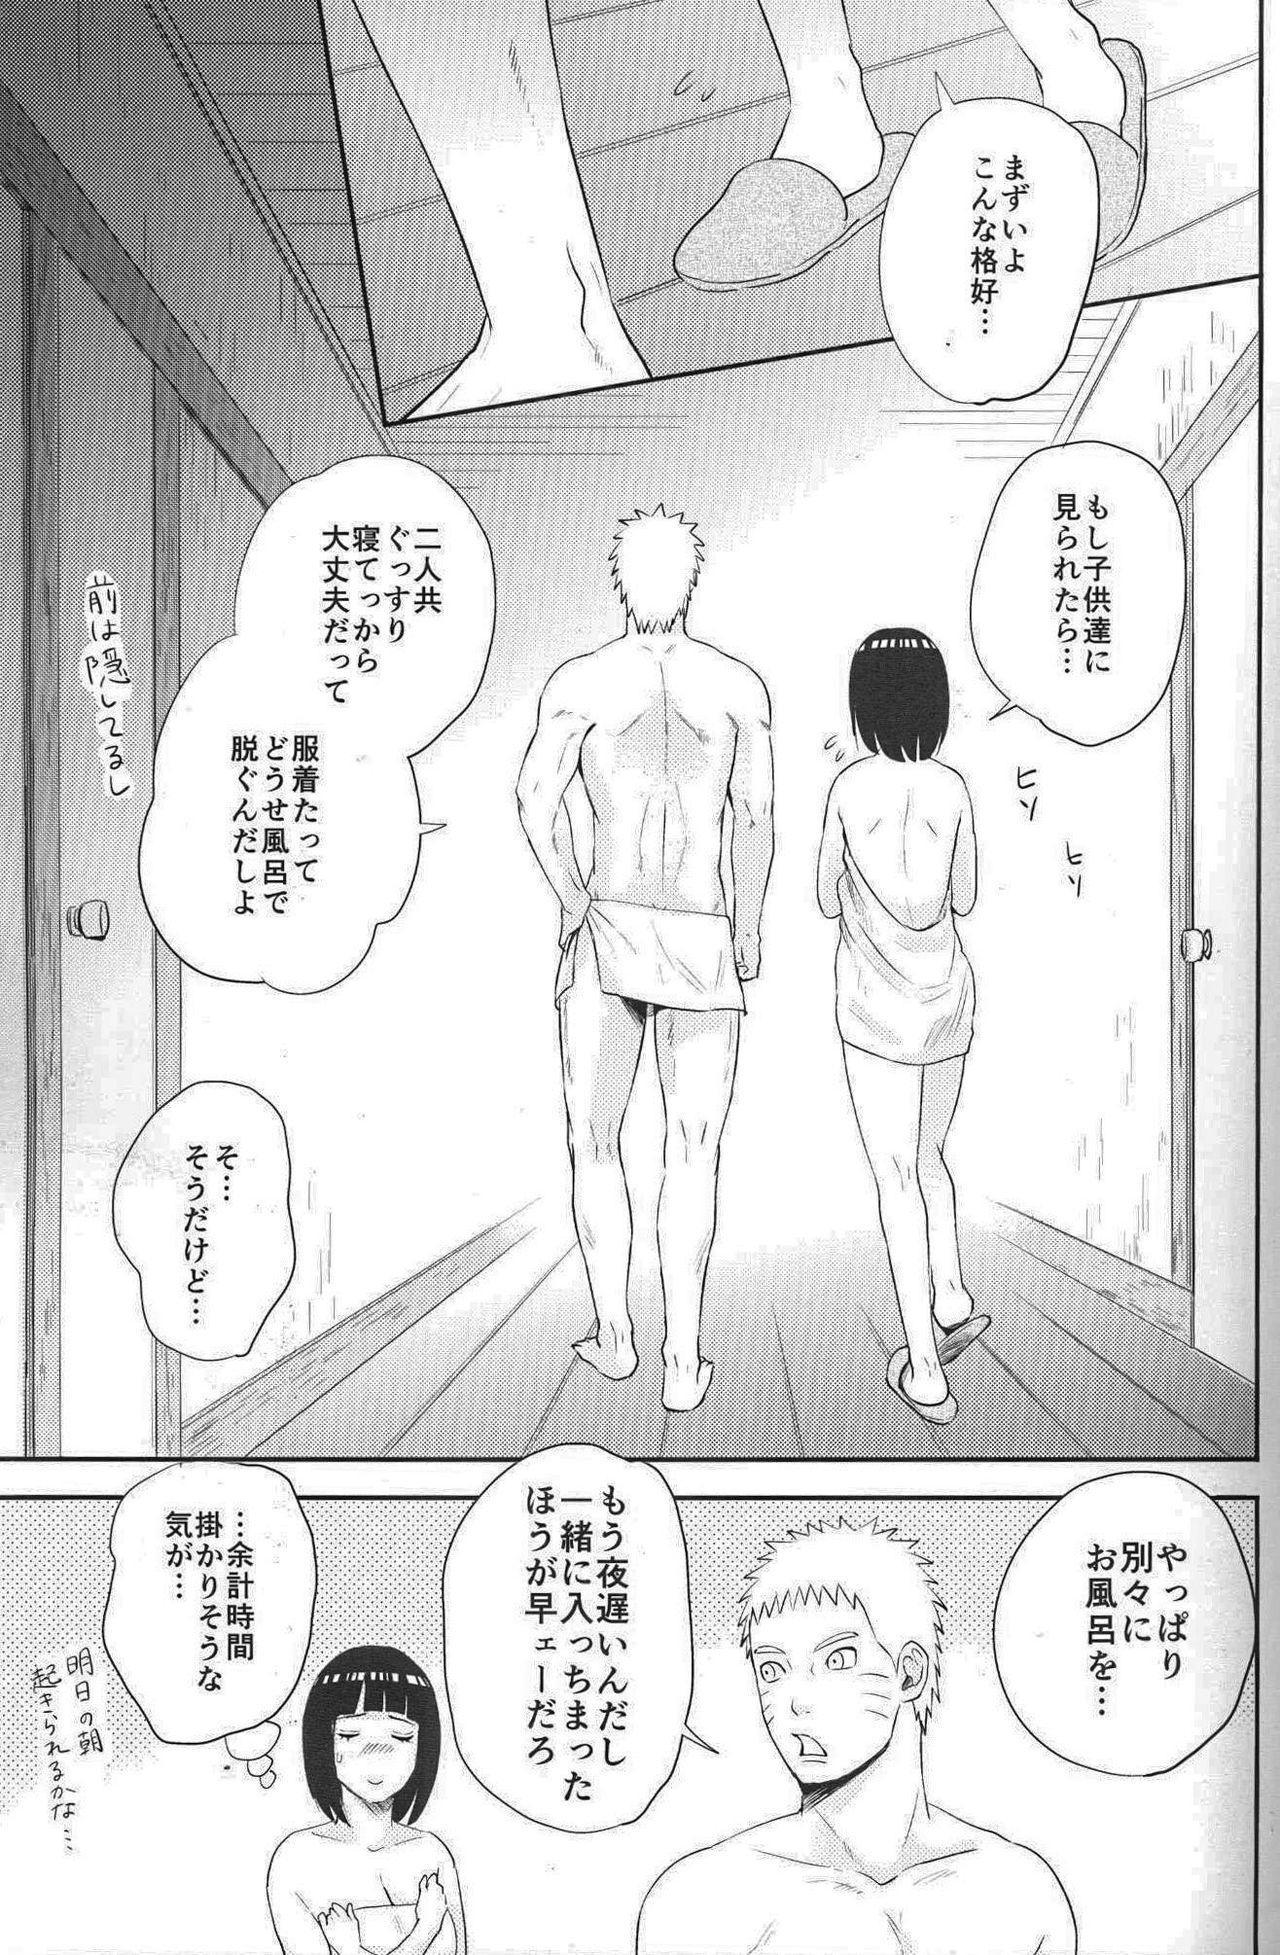 Fuufu no Jikan 39